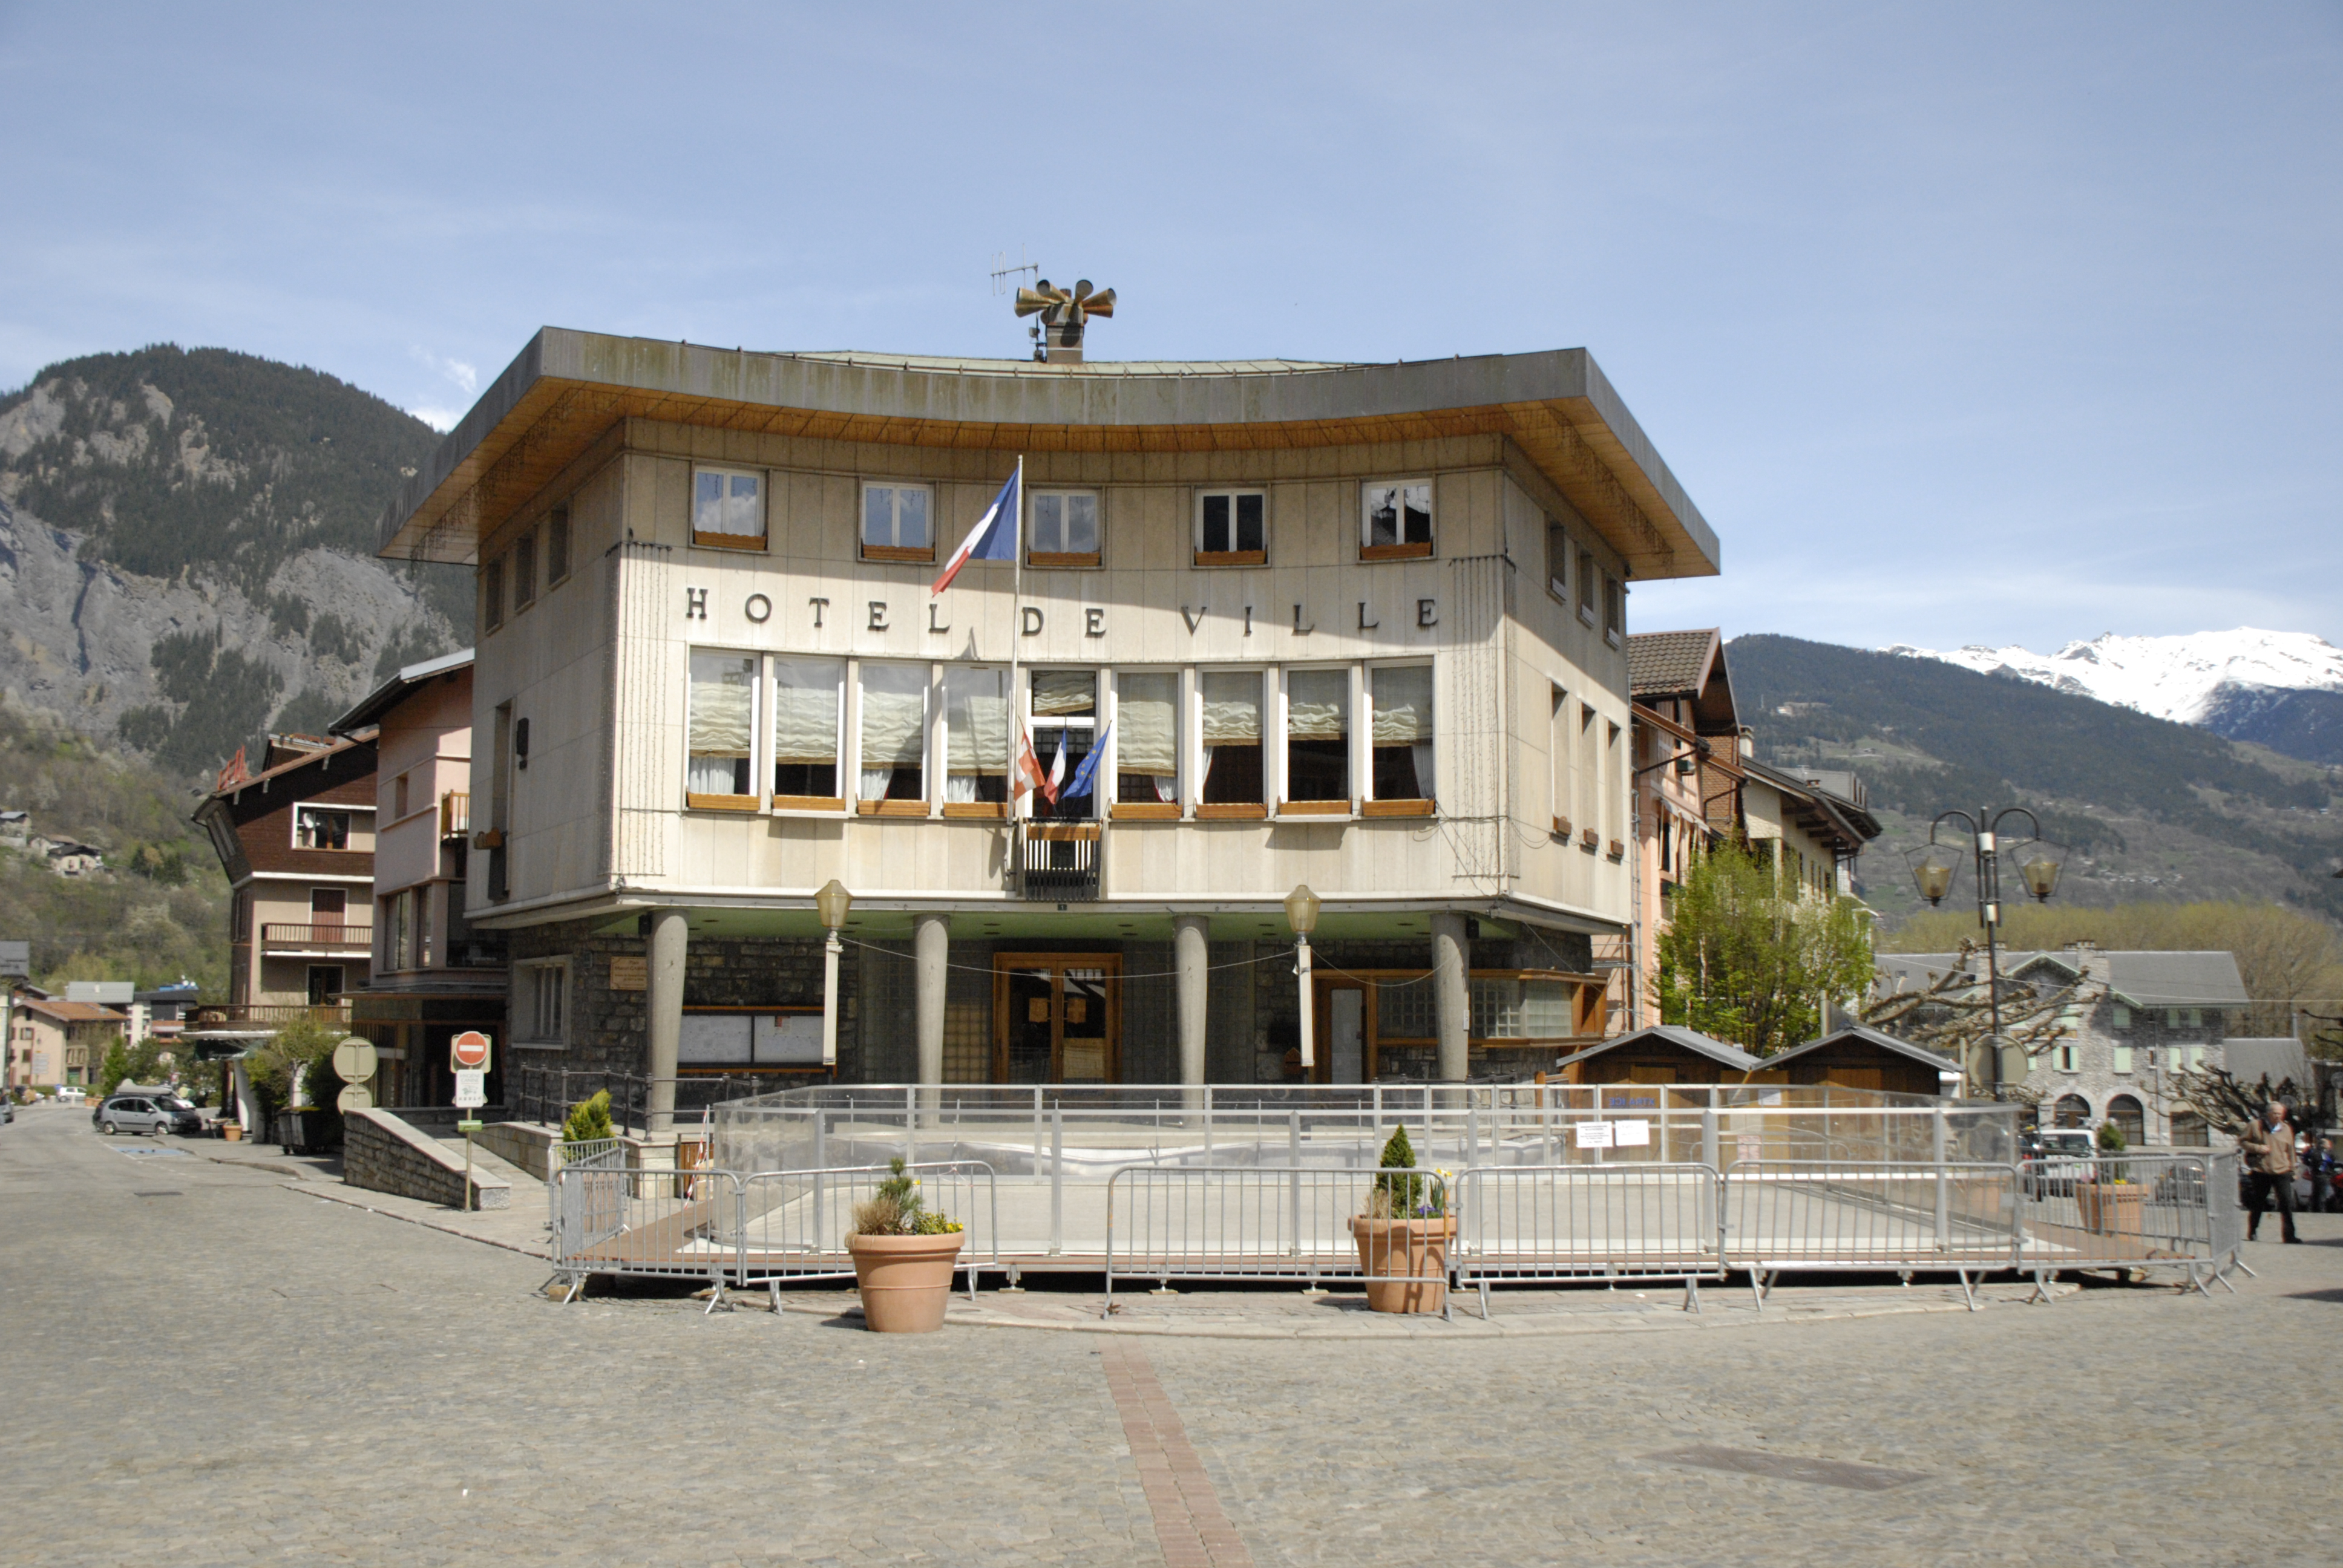 file hotel de ville bourg saint maurice jpg wikimedia